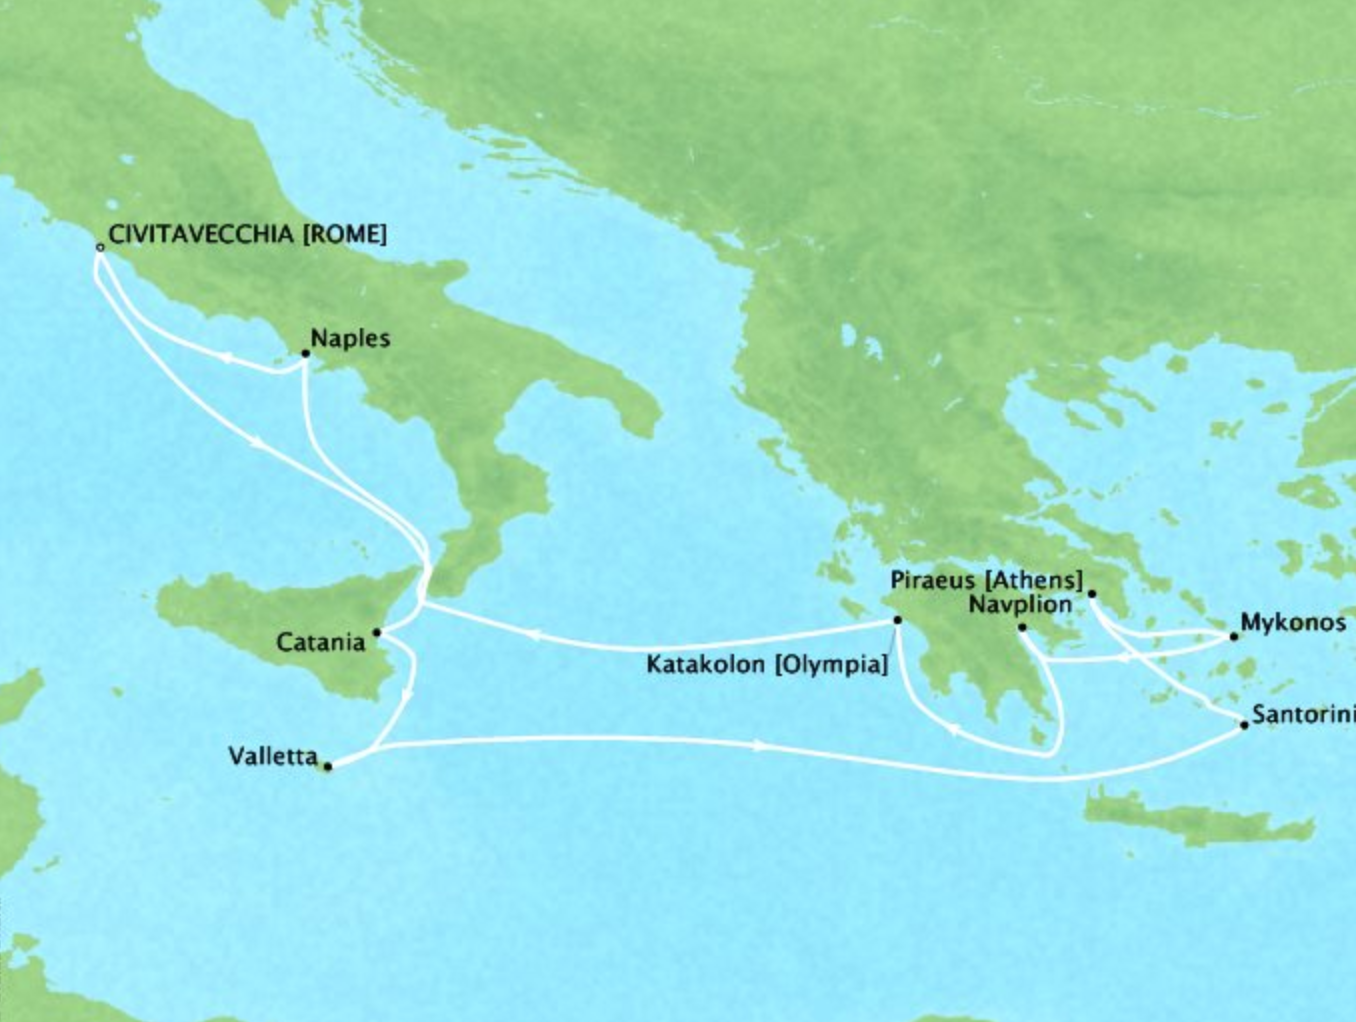 Amalfi Coast and Greek Isles - 12 DaysMultiple datesCivitavecchia, Italy to Civitavecchia, ItalyVirtuoso Voyages benefit